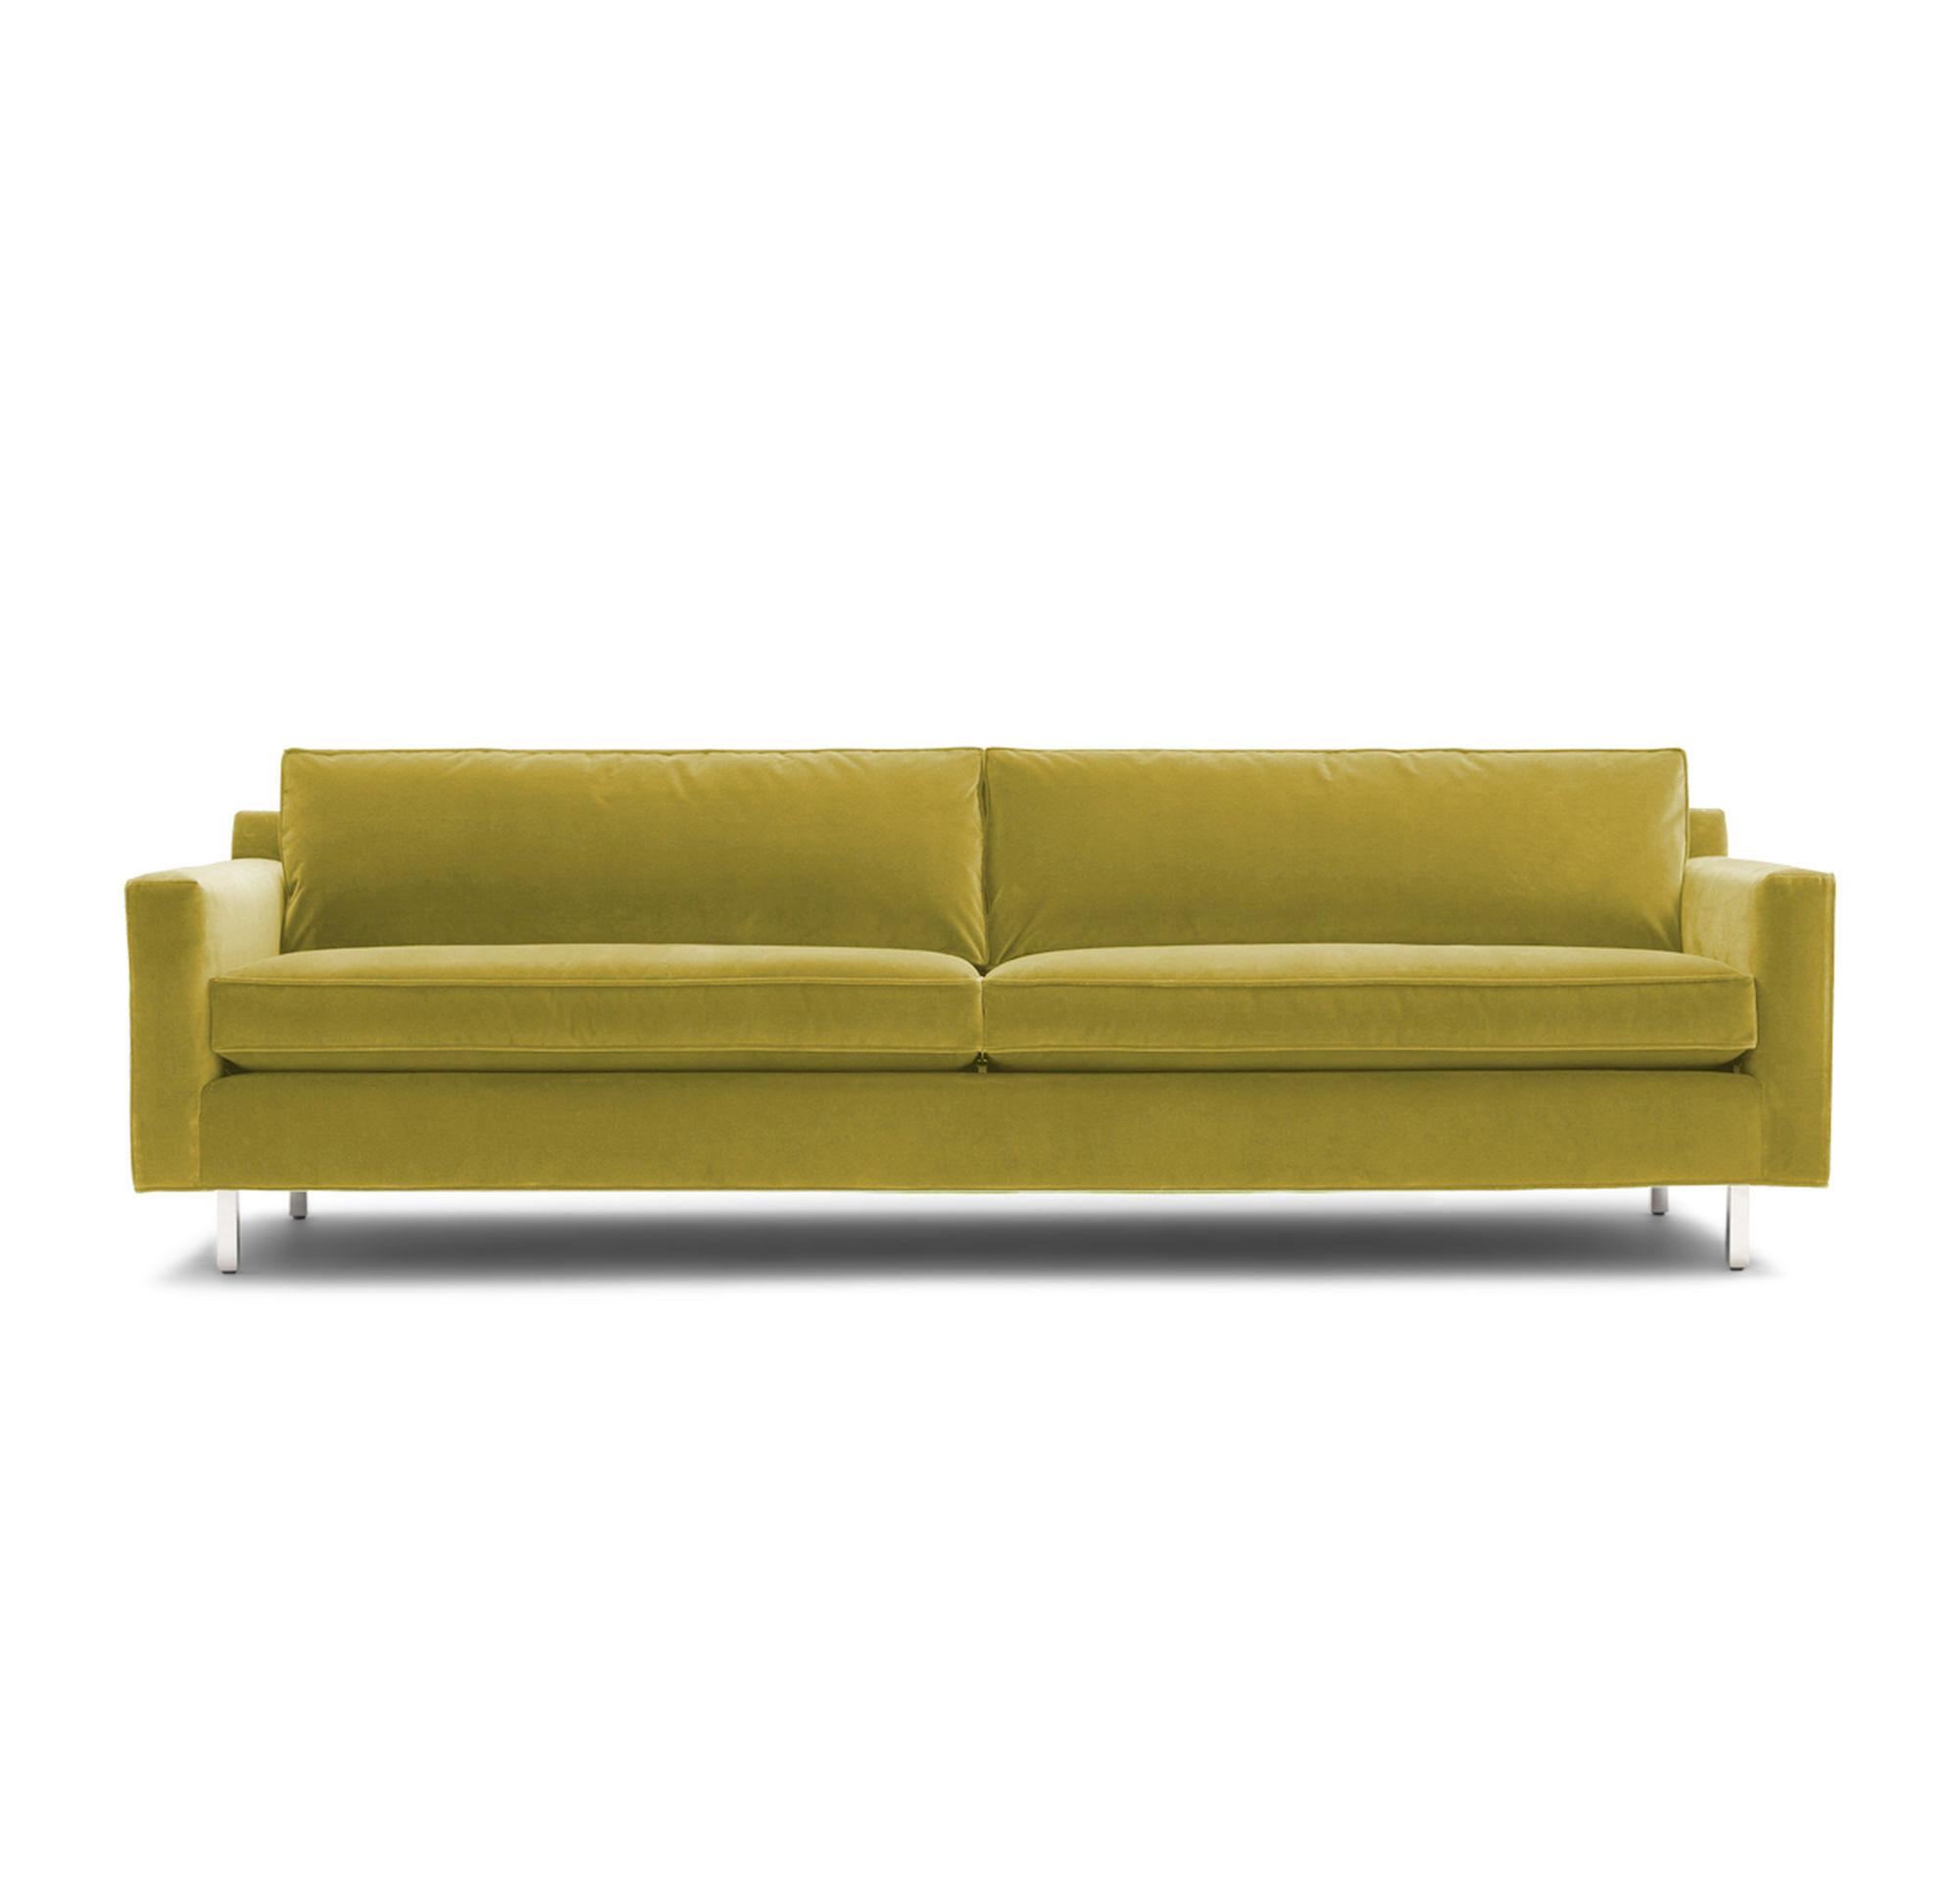 mitc gold hunter sofa heavy duty protector mgbw clifton sectional thesofa